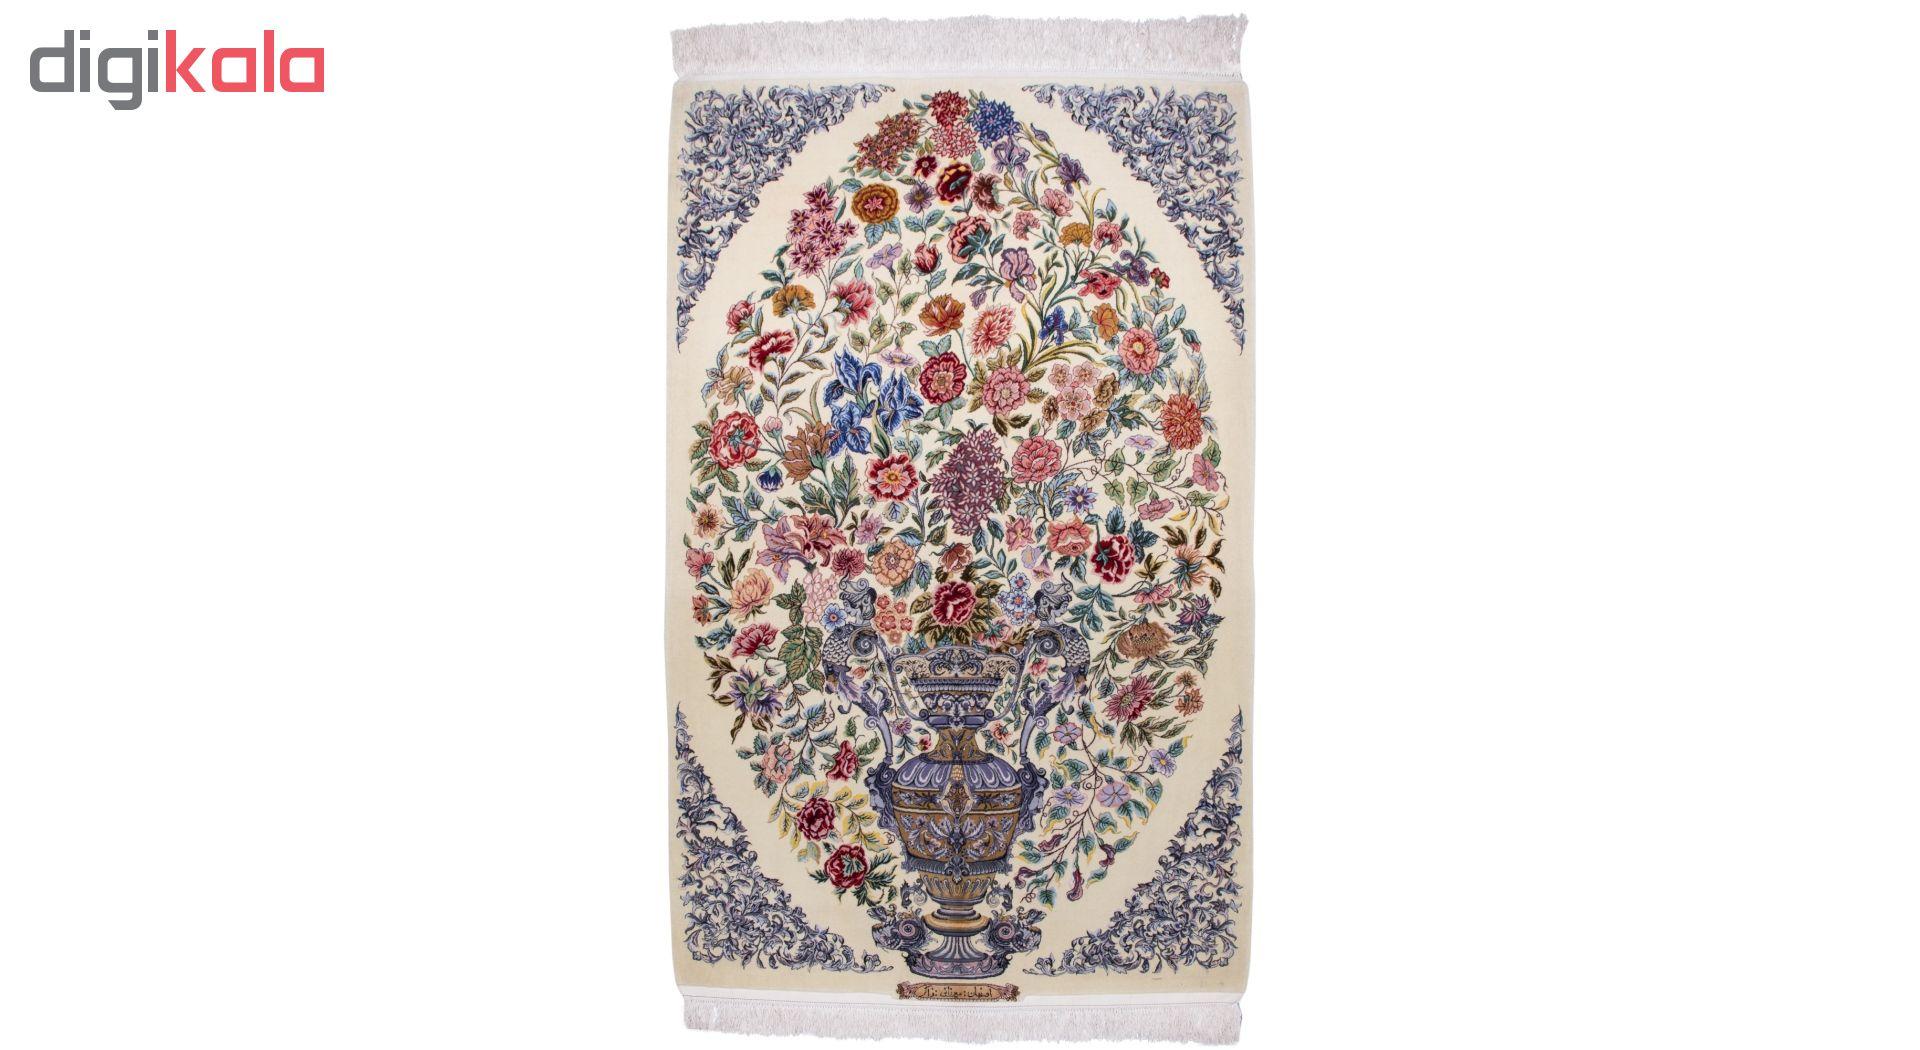 فرش دستباف ذرع و نیم سی پرشیا کد 173009